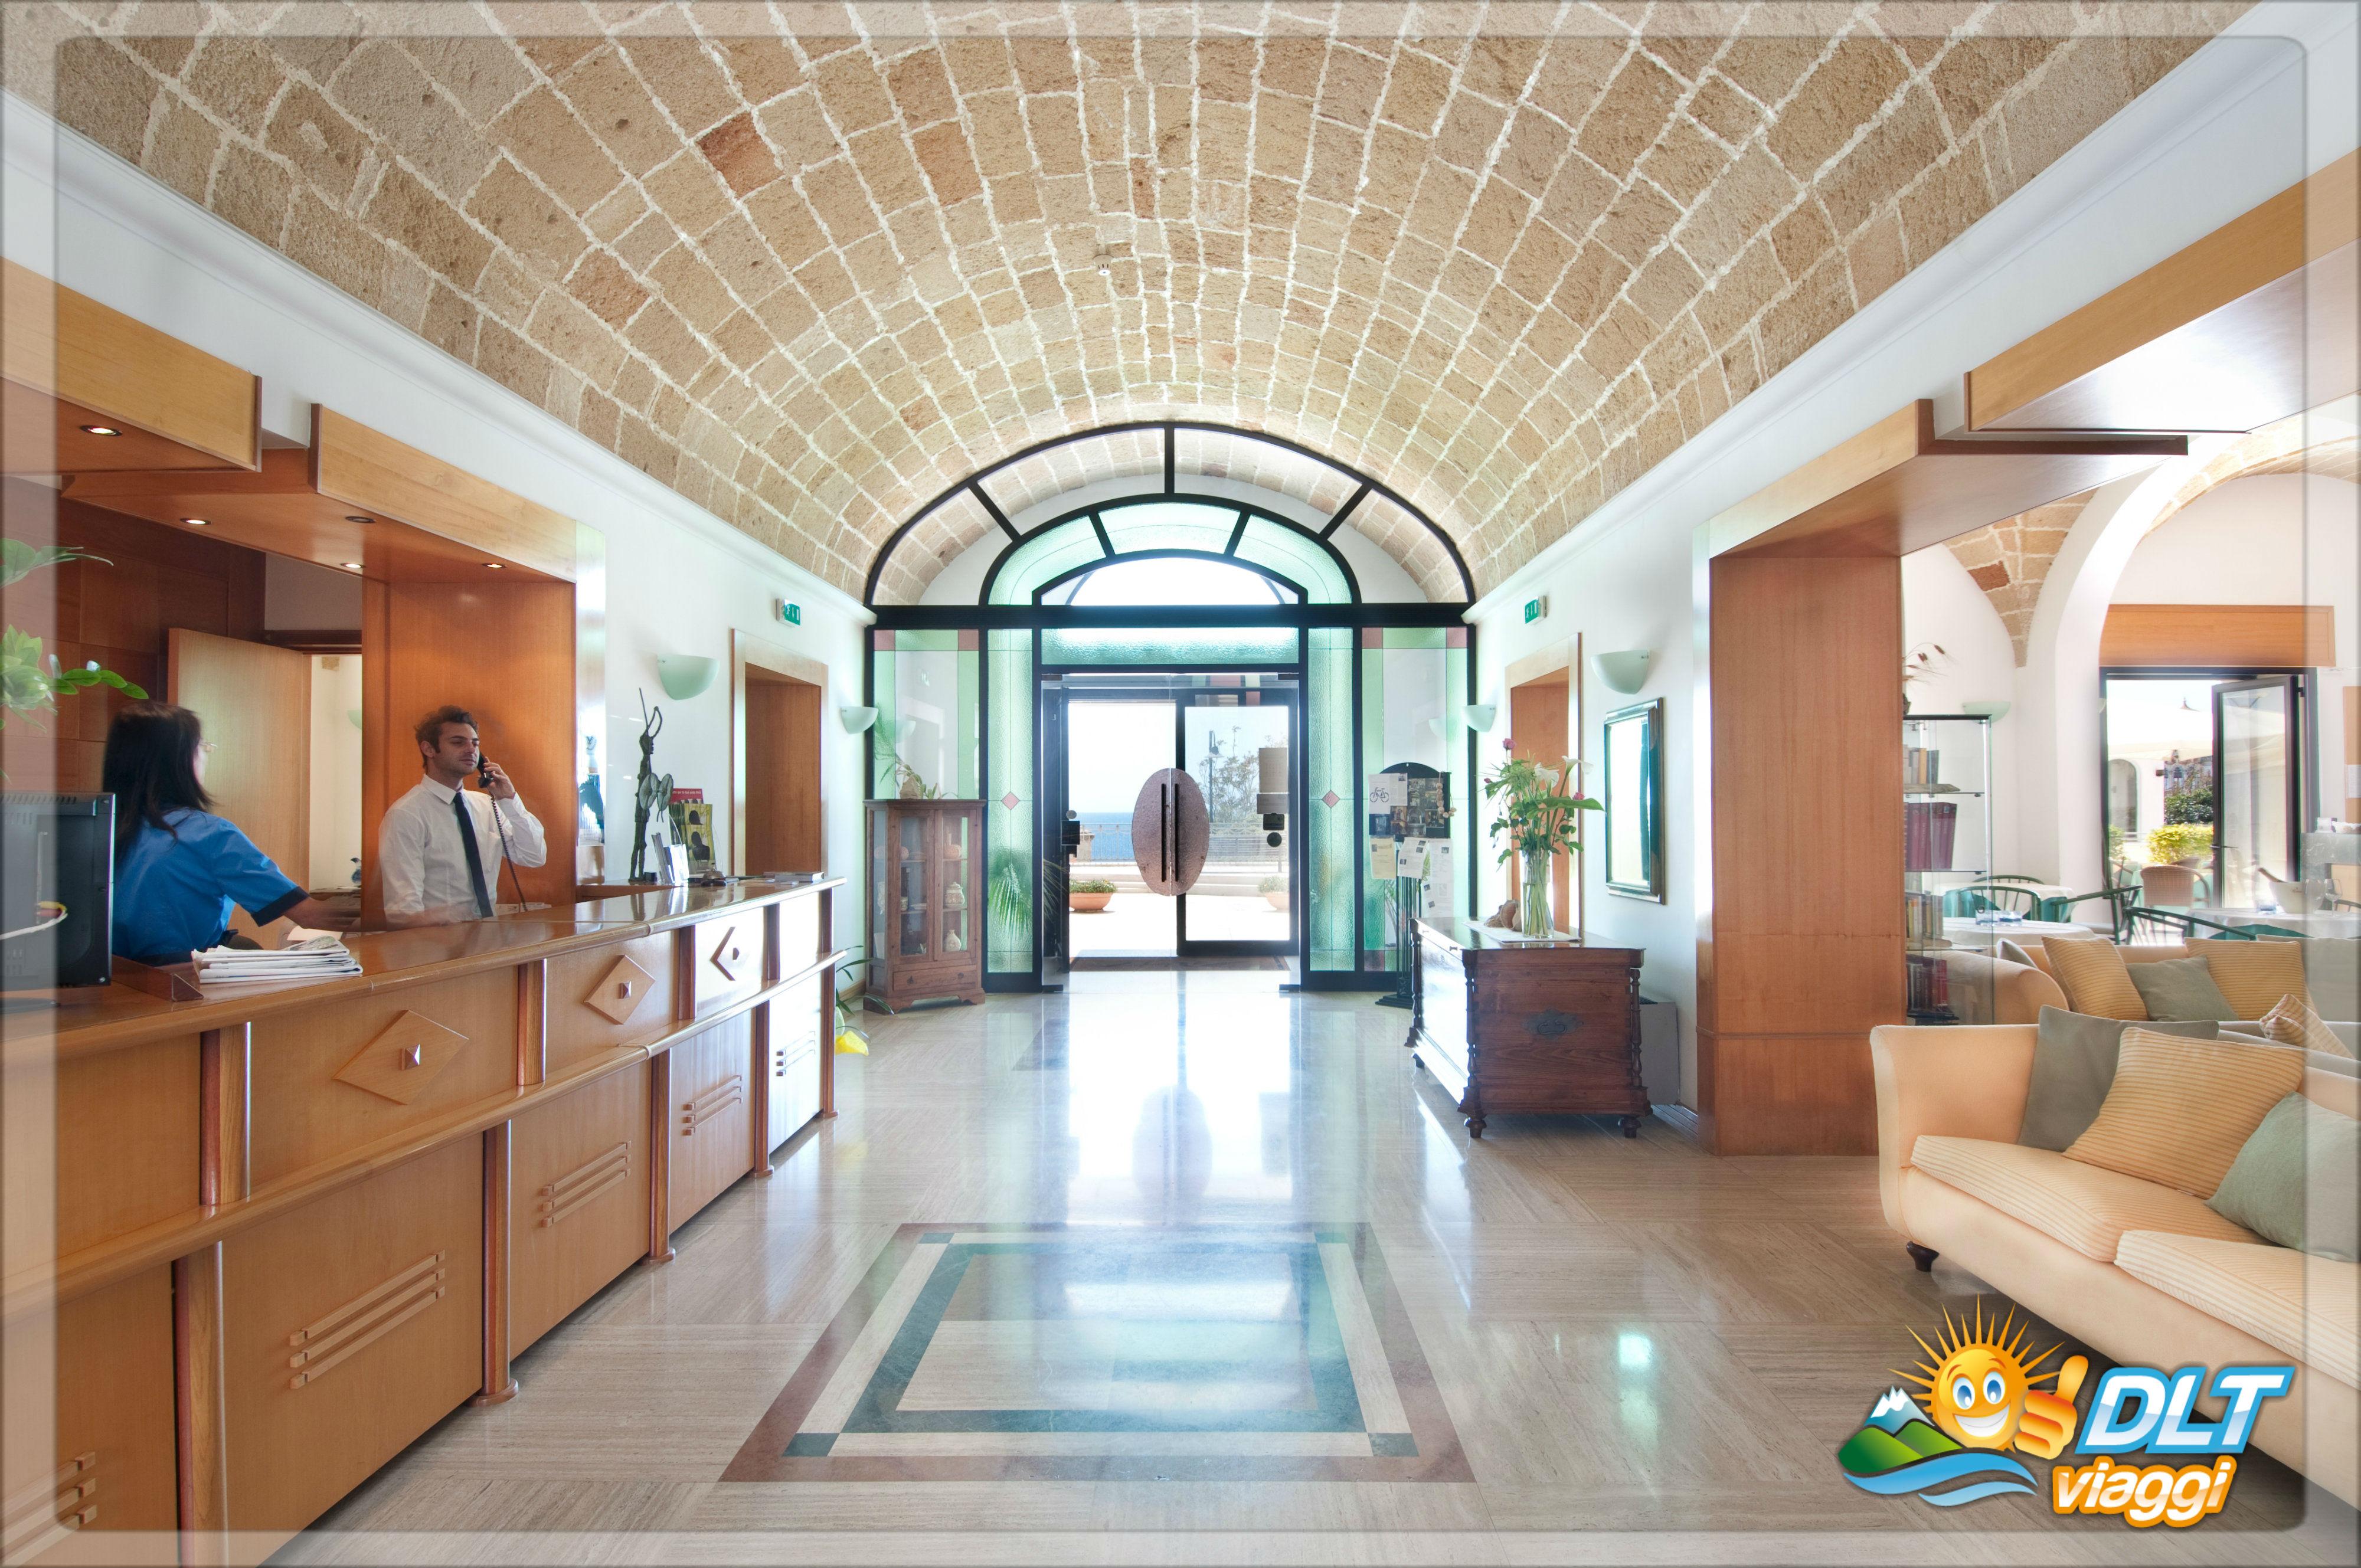 Grand Hotel Mediterraneo Santa Cesarea Terme Apulien Dlt Travel